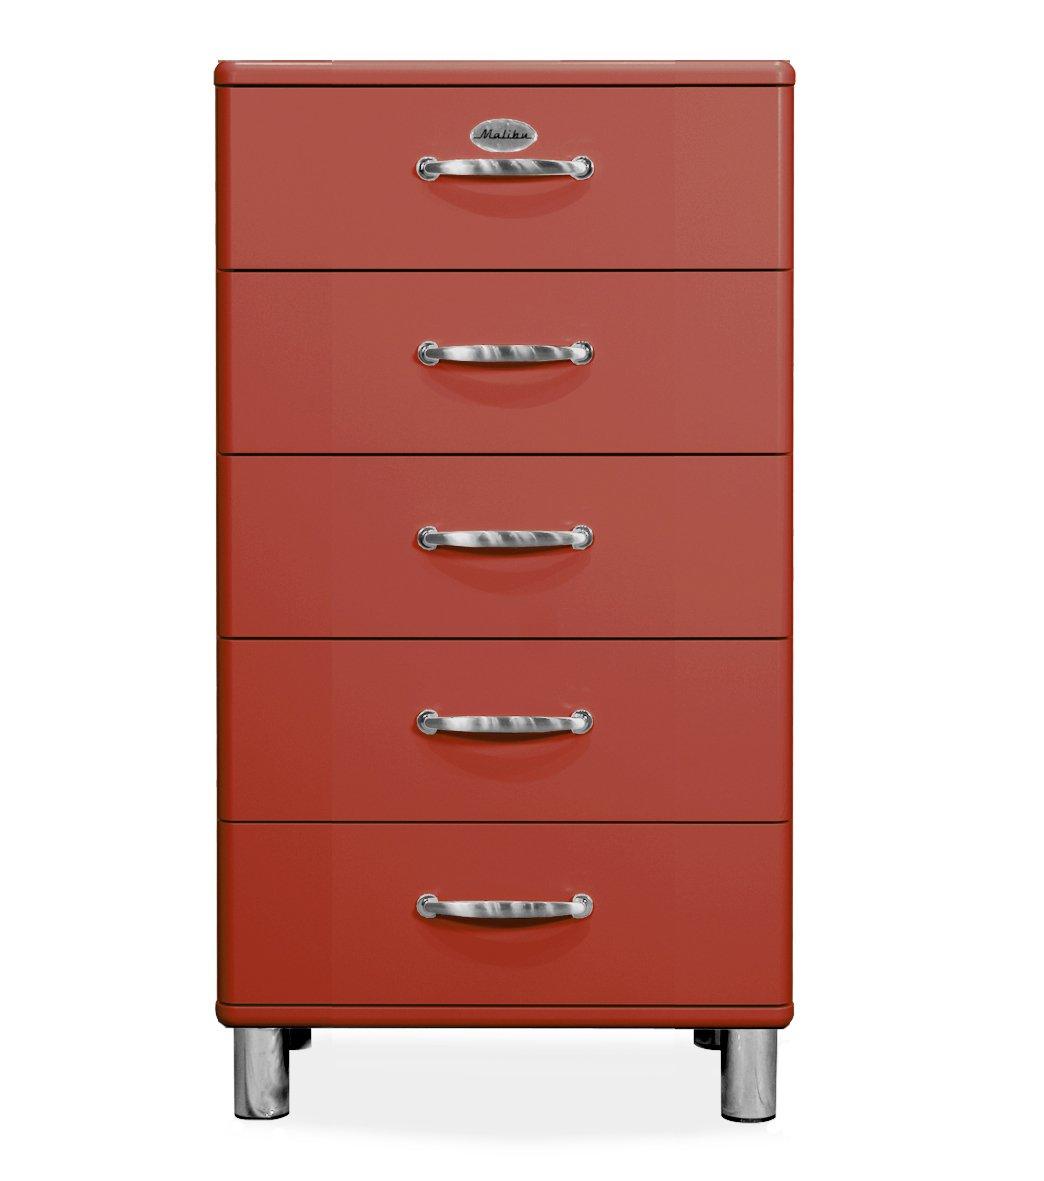 Tenzo 5215-028 Malibu Designer Kommode, MDF lackiert, 111 x 60 x 41 cm, rot